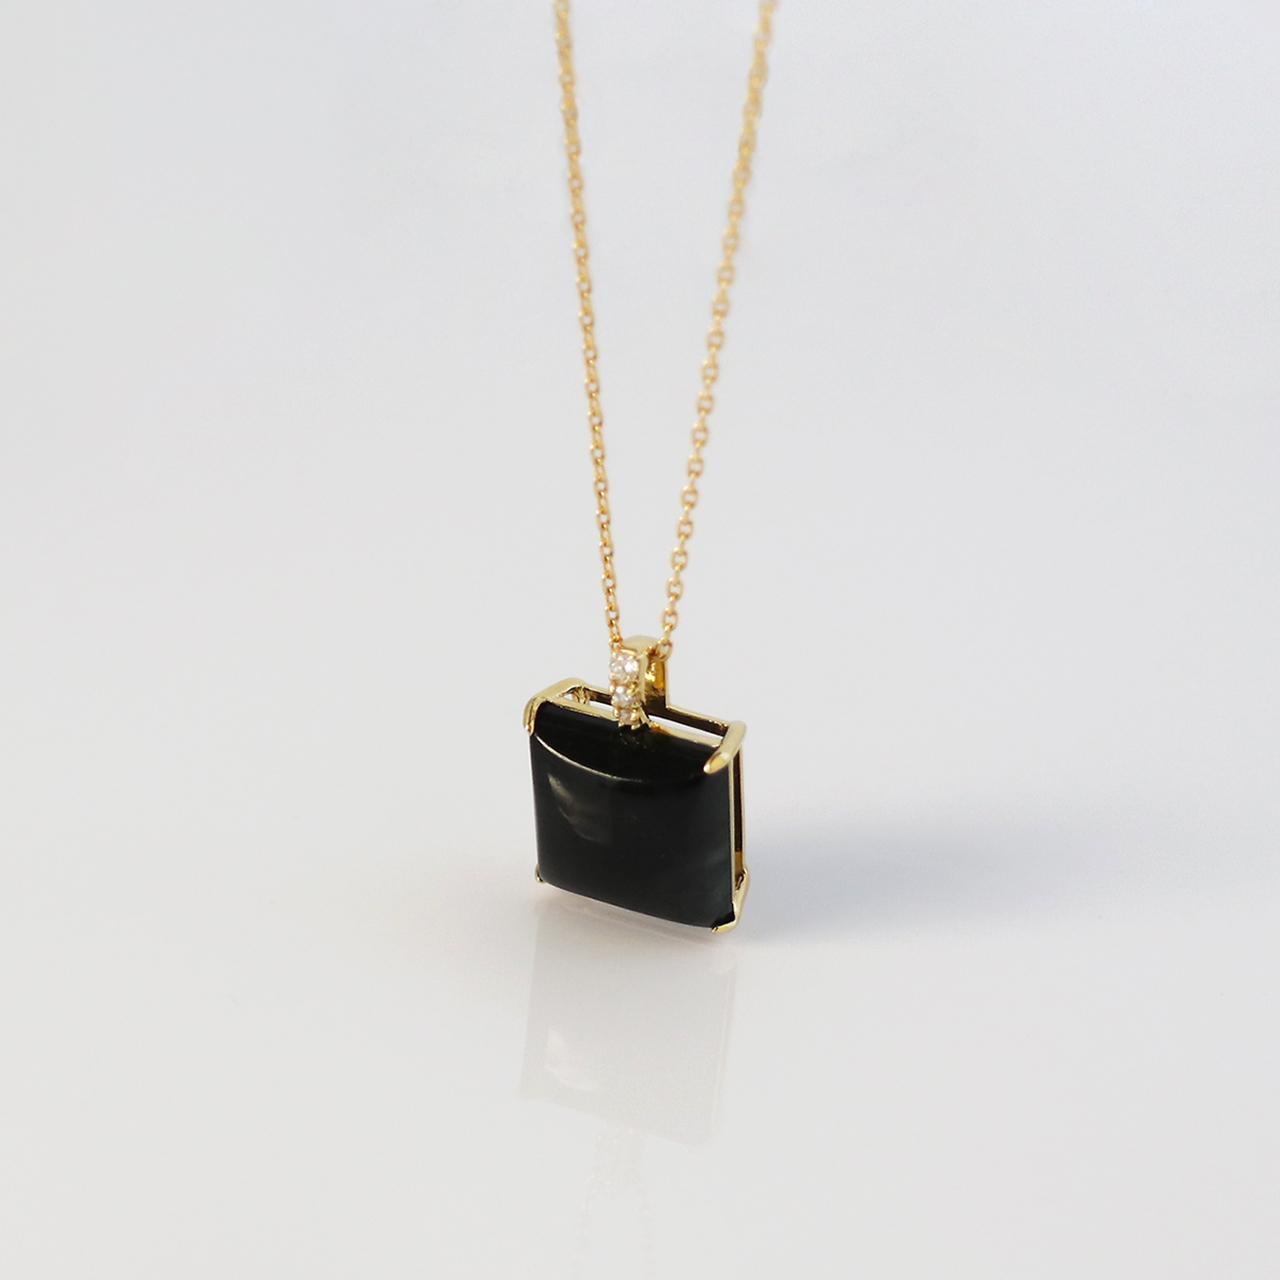 NAGI 'SUMI' / Necklace (Black)